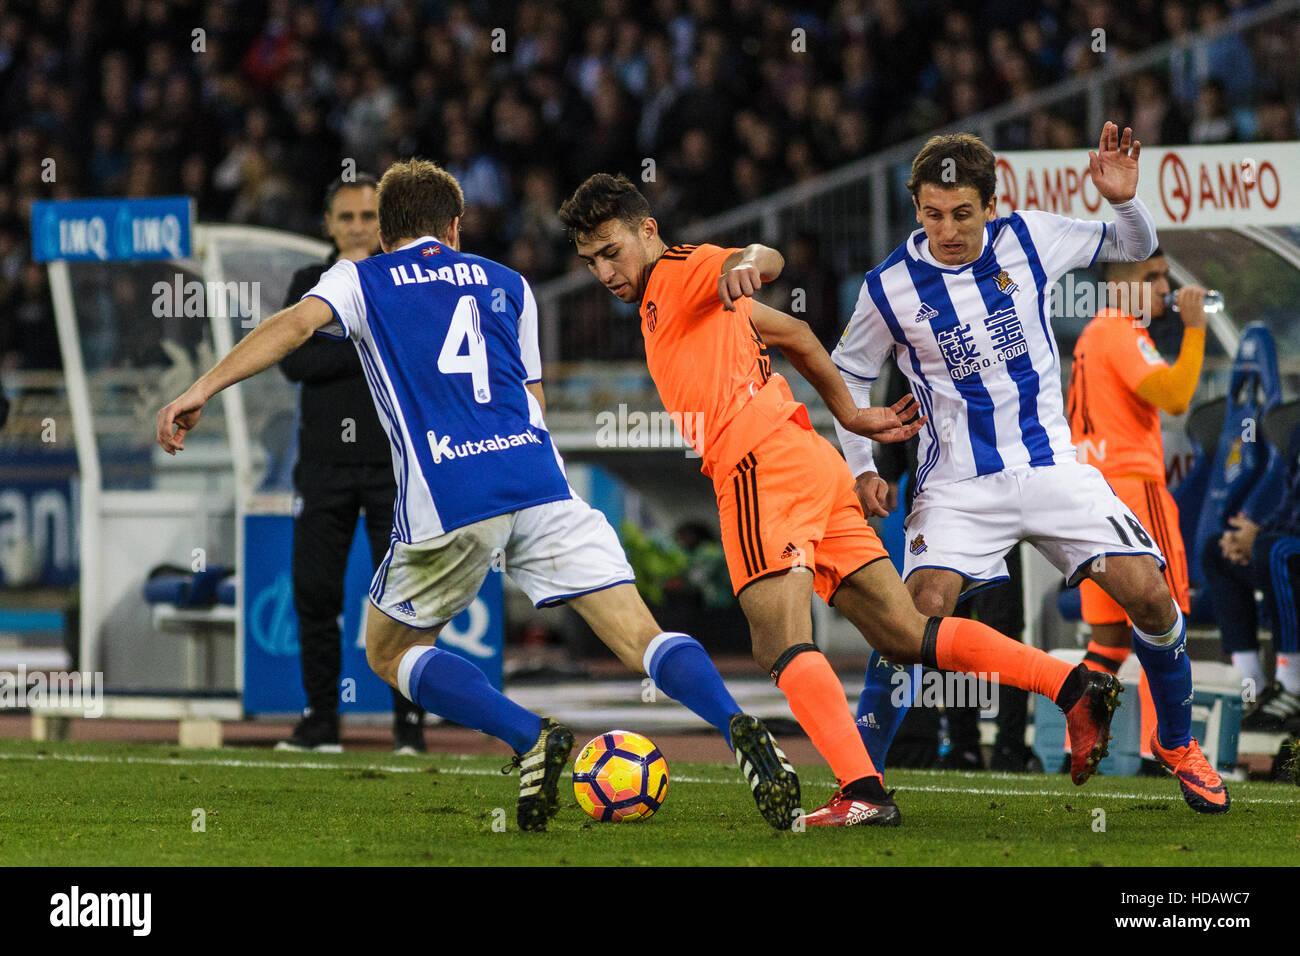 San Sebastian, Gipuzcoa, Spain. 10th December, 2016. Valencia forward Munir uner presure during the Liga Santander - Stock Image